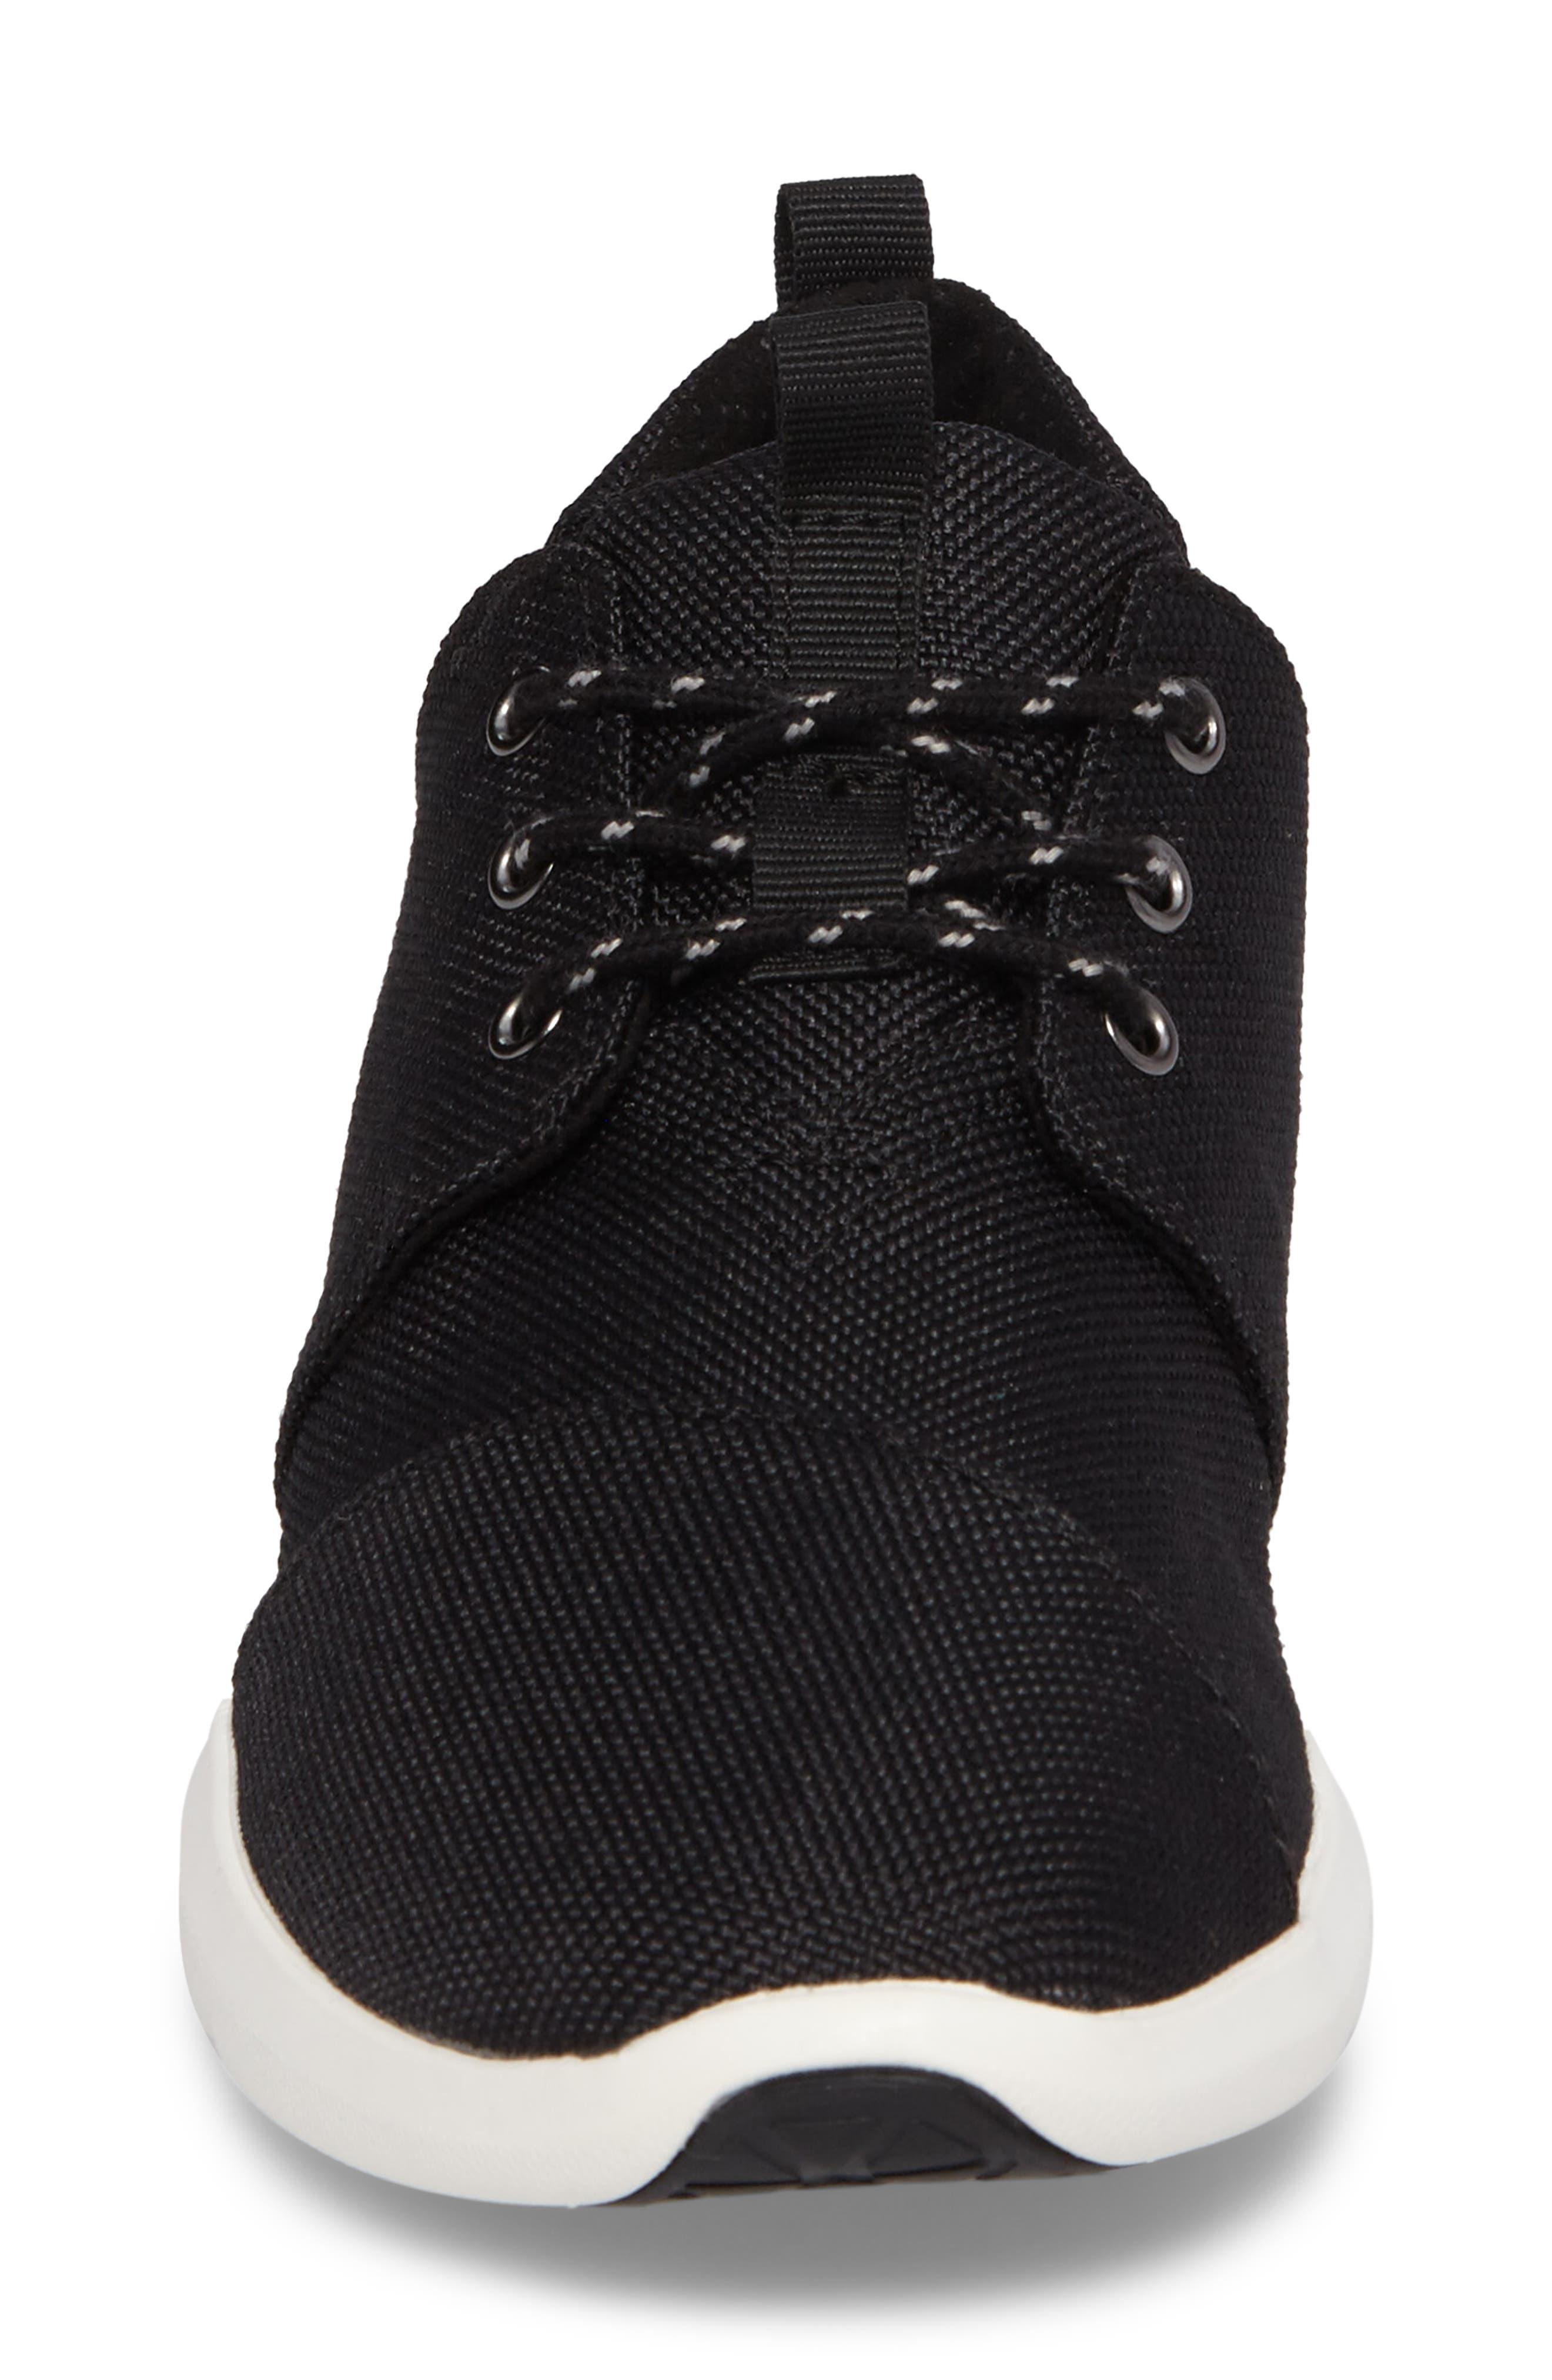 Del Ray Sneaker,                             Alternate thumbnail 4, color,                             002